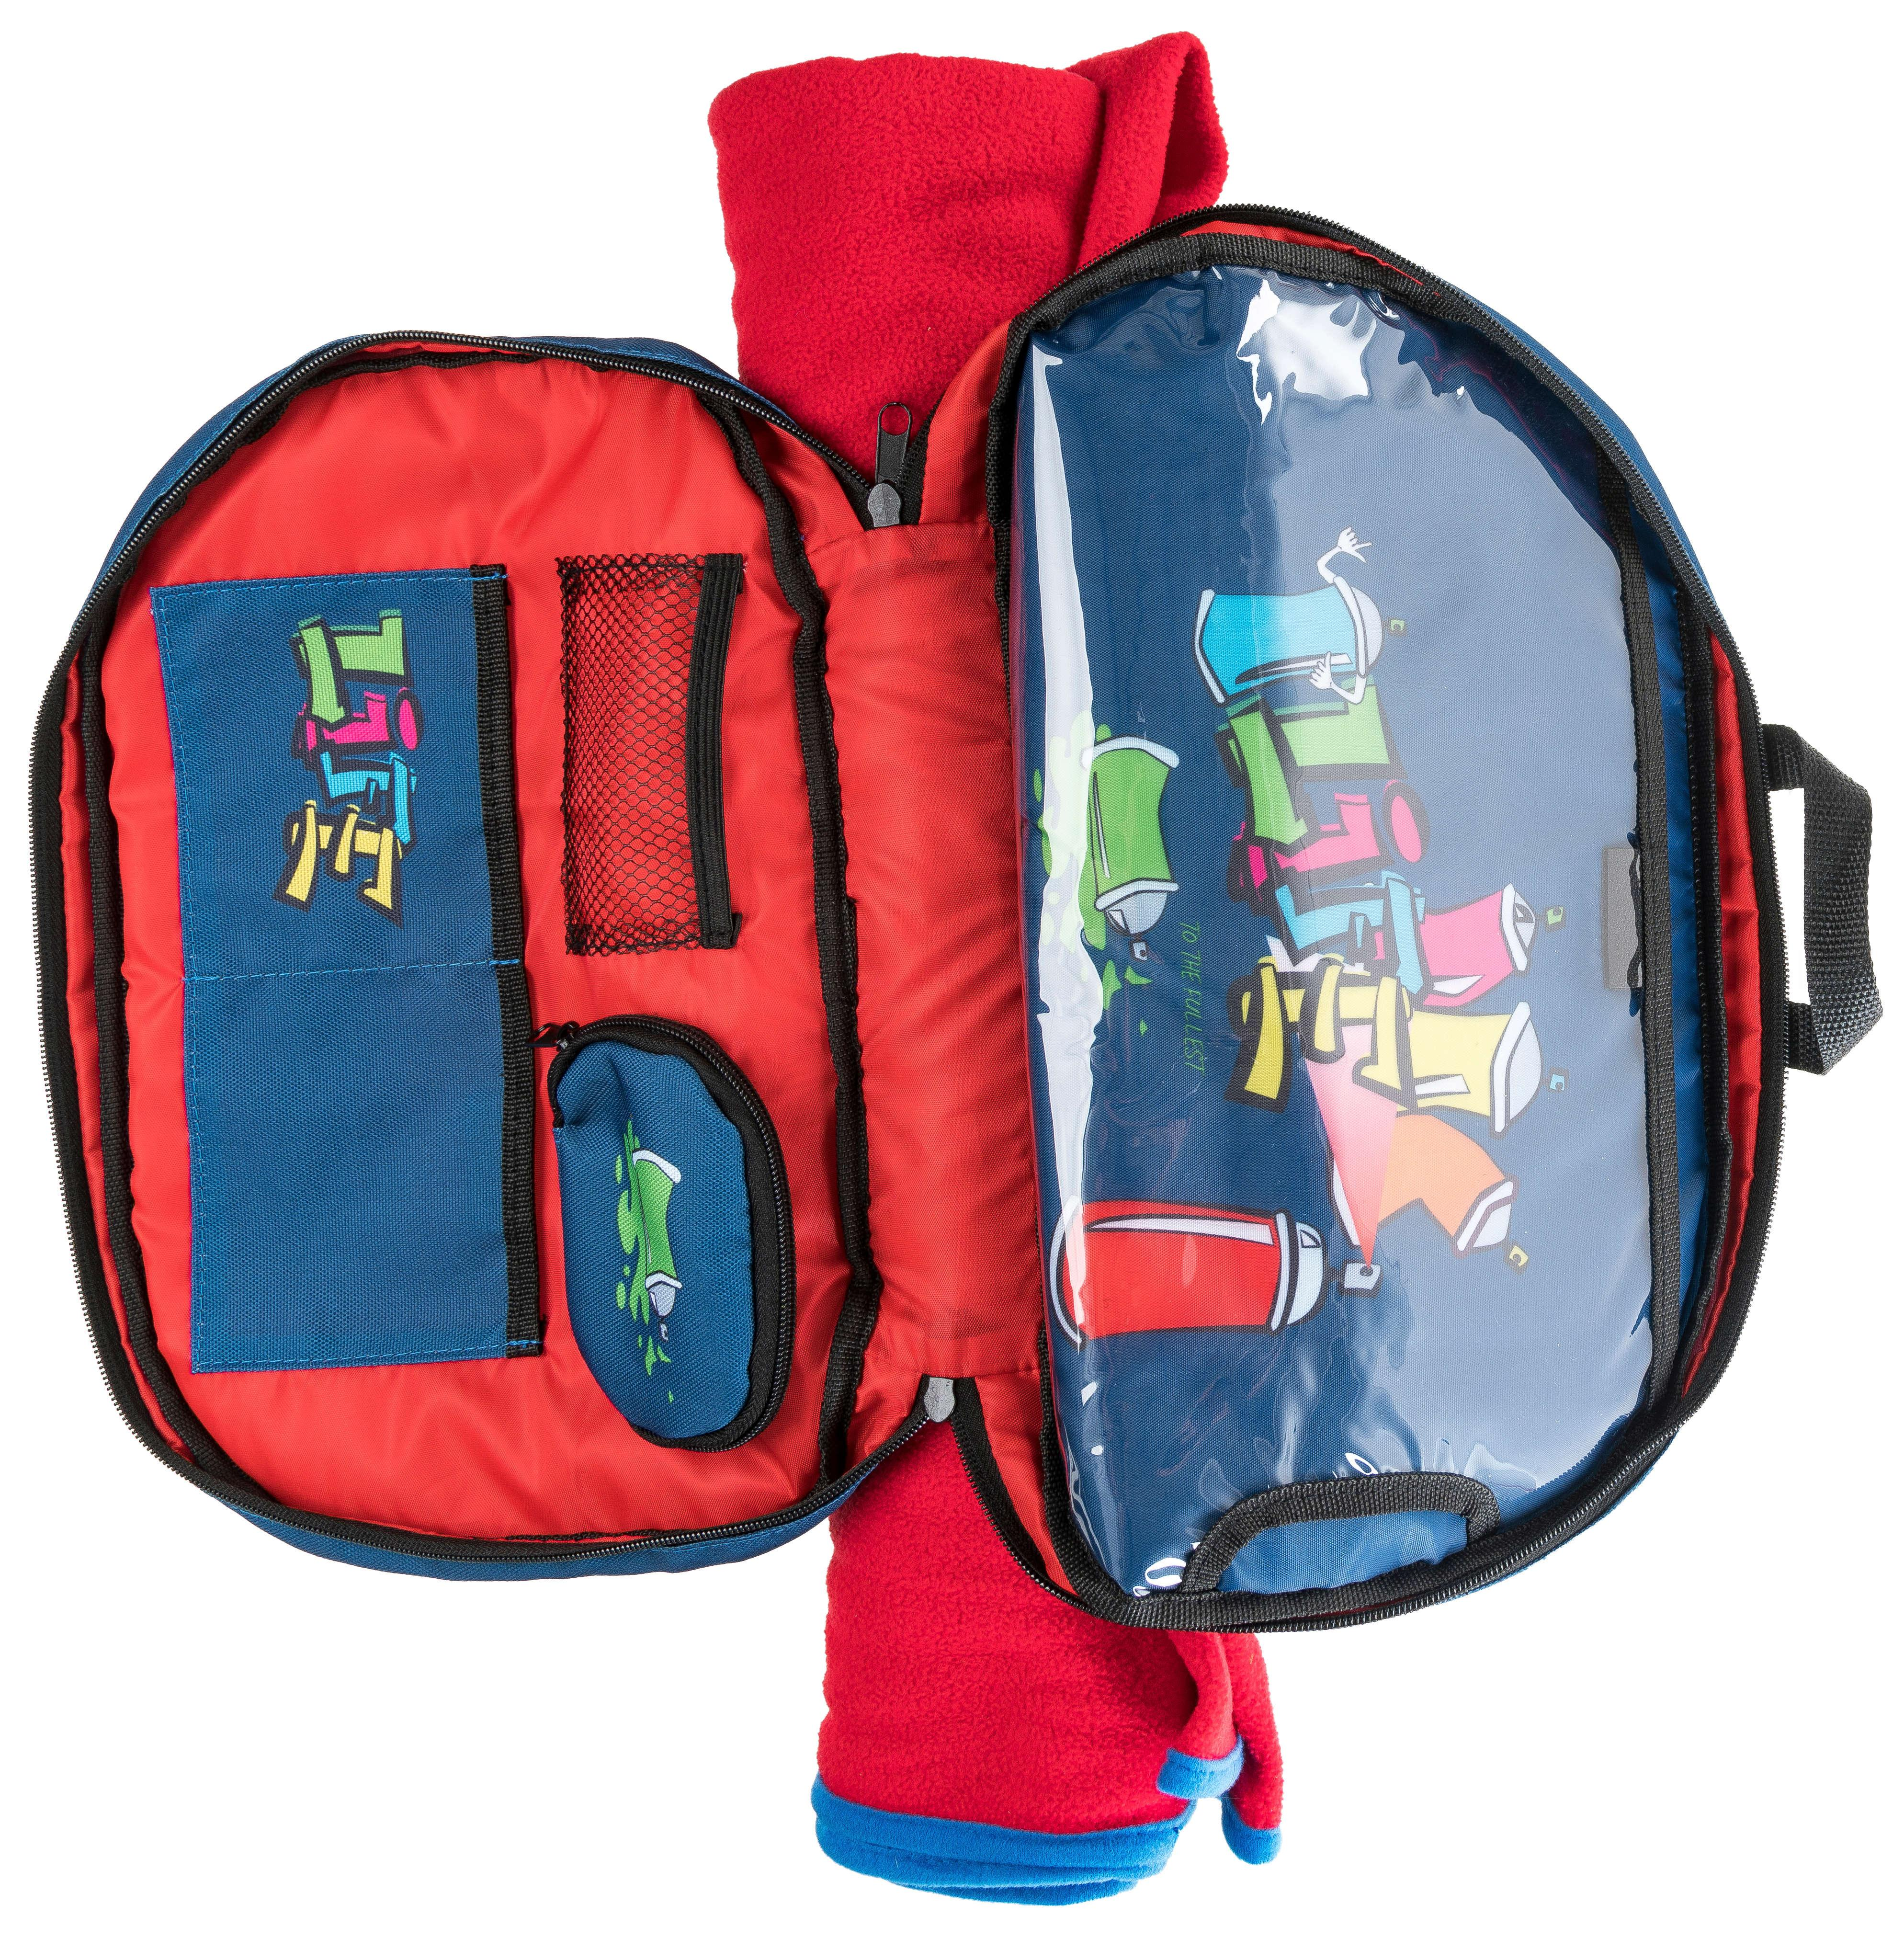 Luggage bag WALSER 26180 expert knowledge